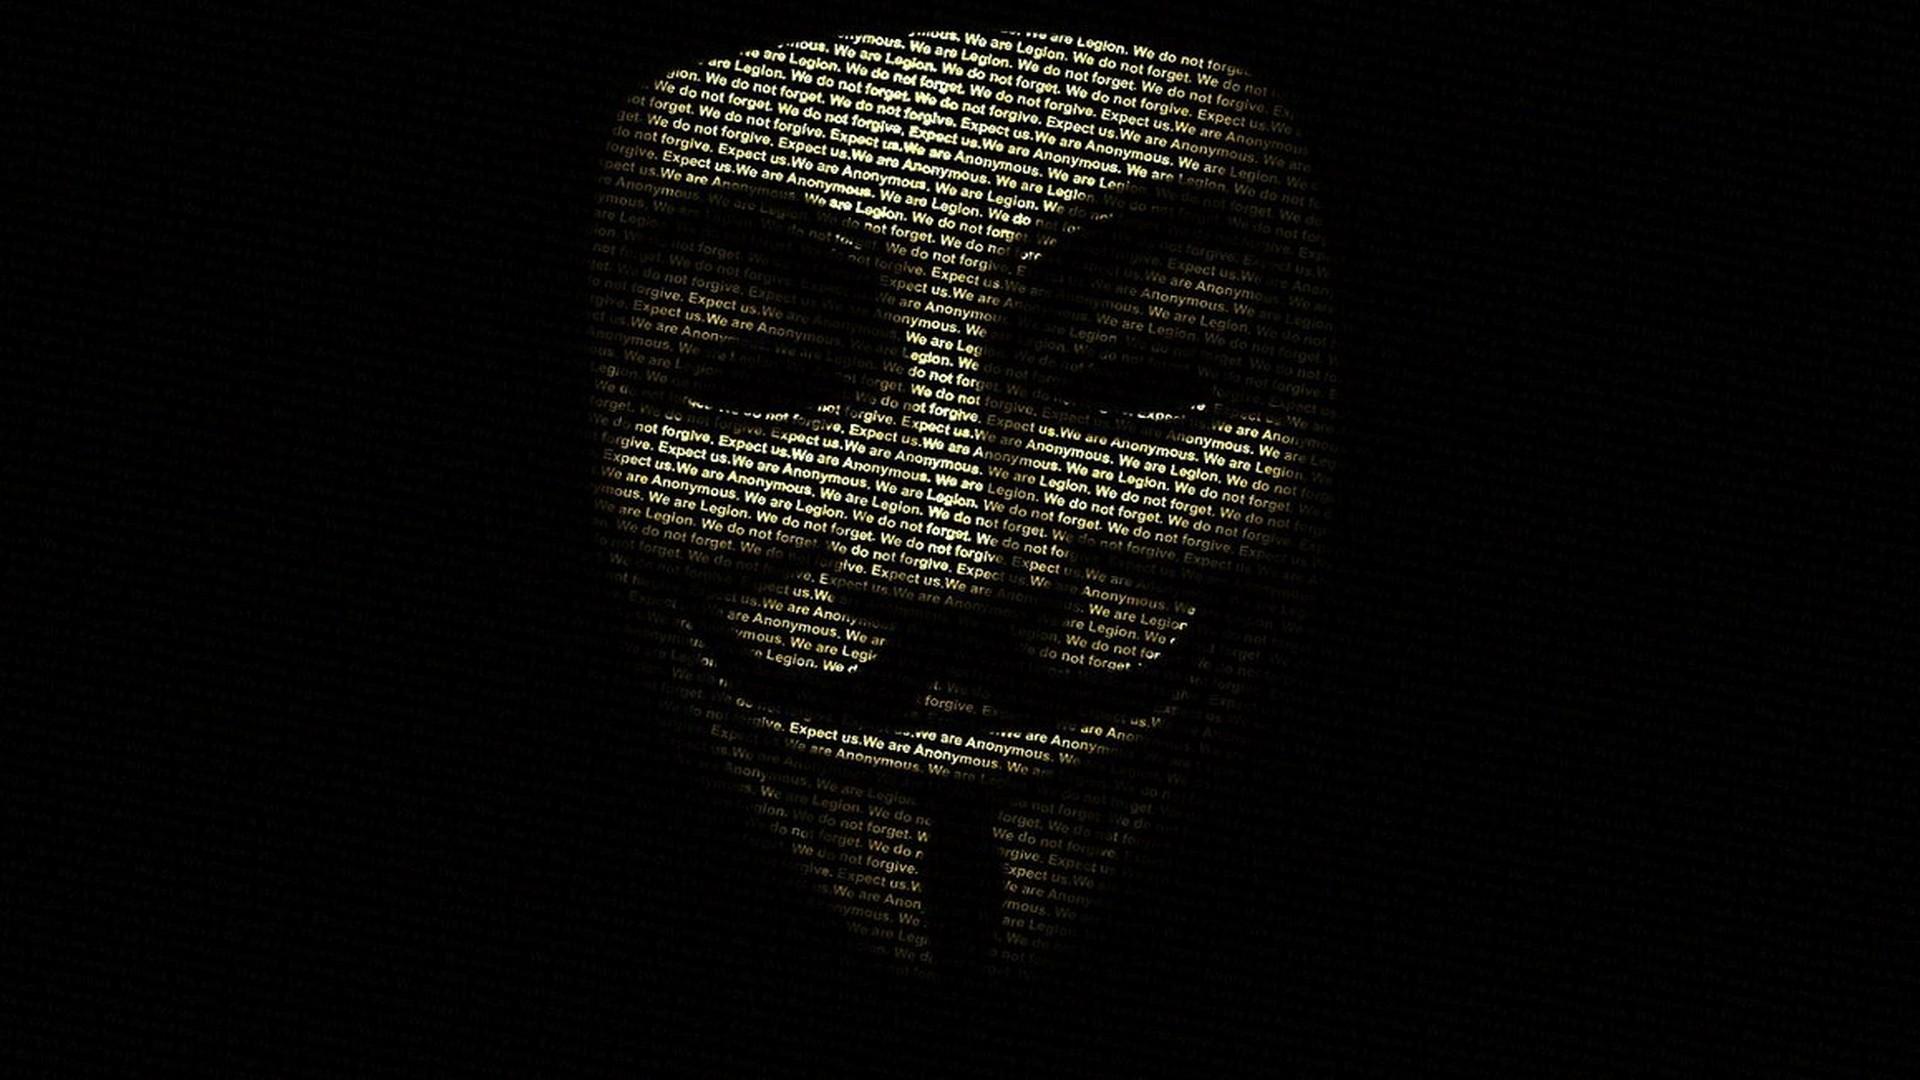 Cute Wallpapers Romance Masks Symbols And V For Vendetta 183 My Broken Blog